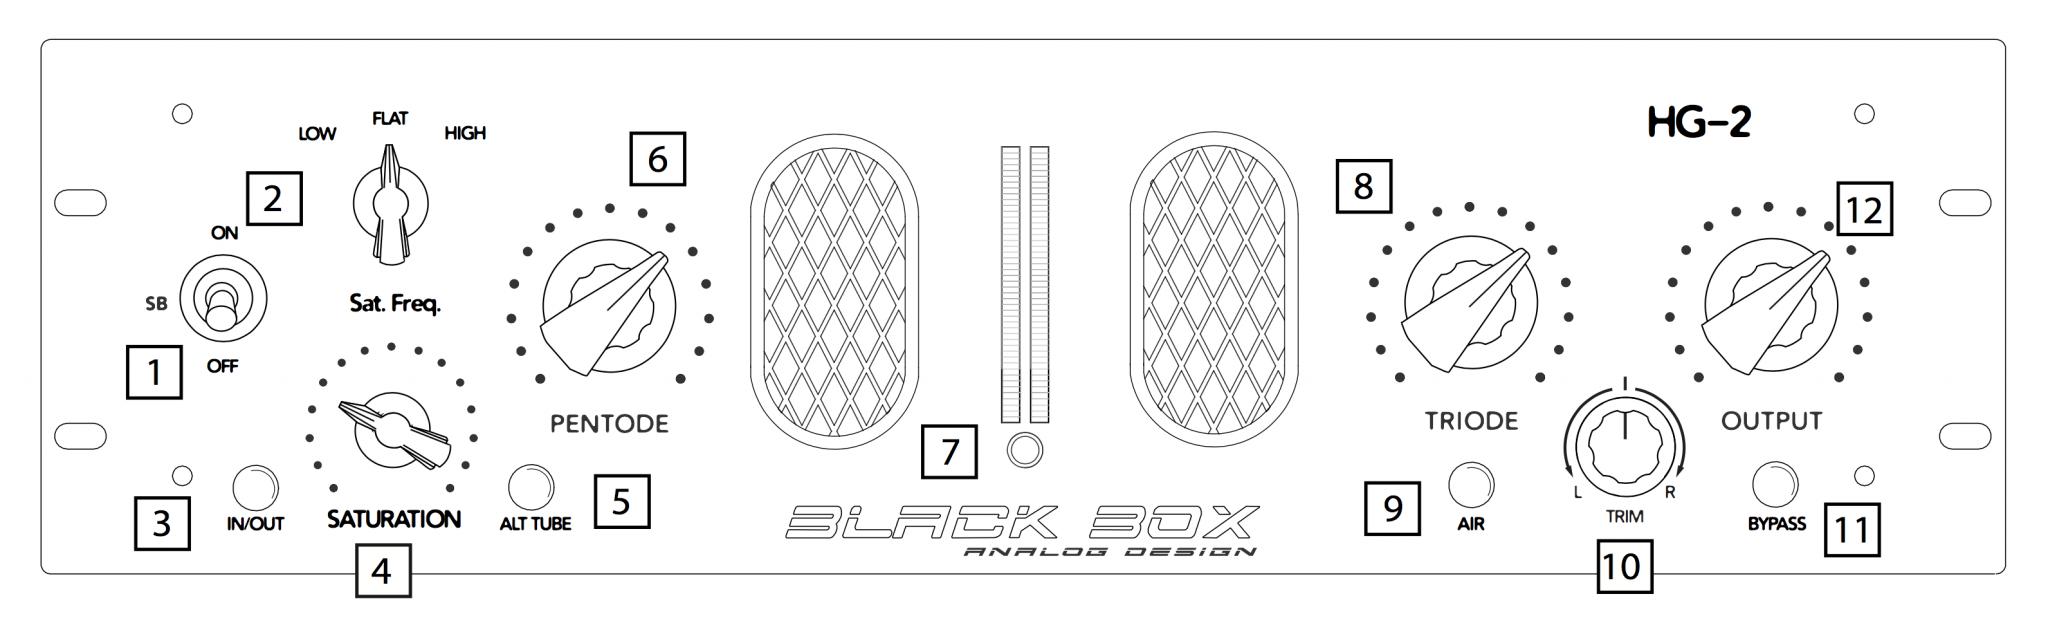 HG-2 — Black Box Analog Design